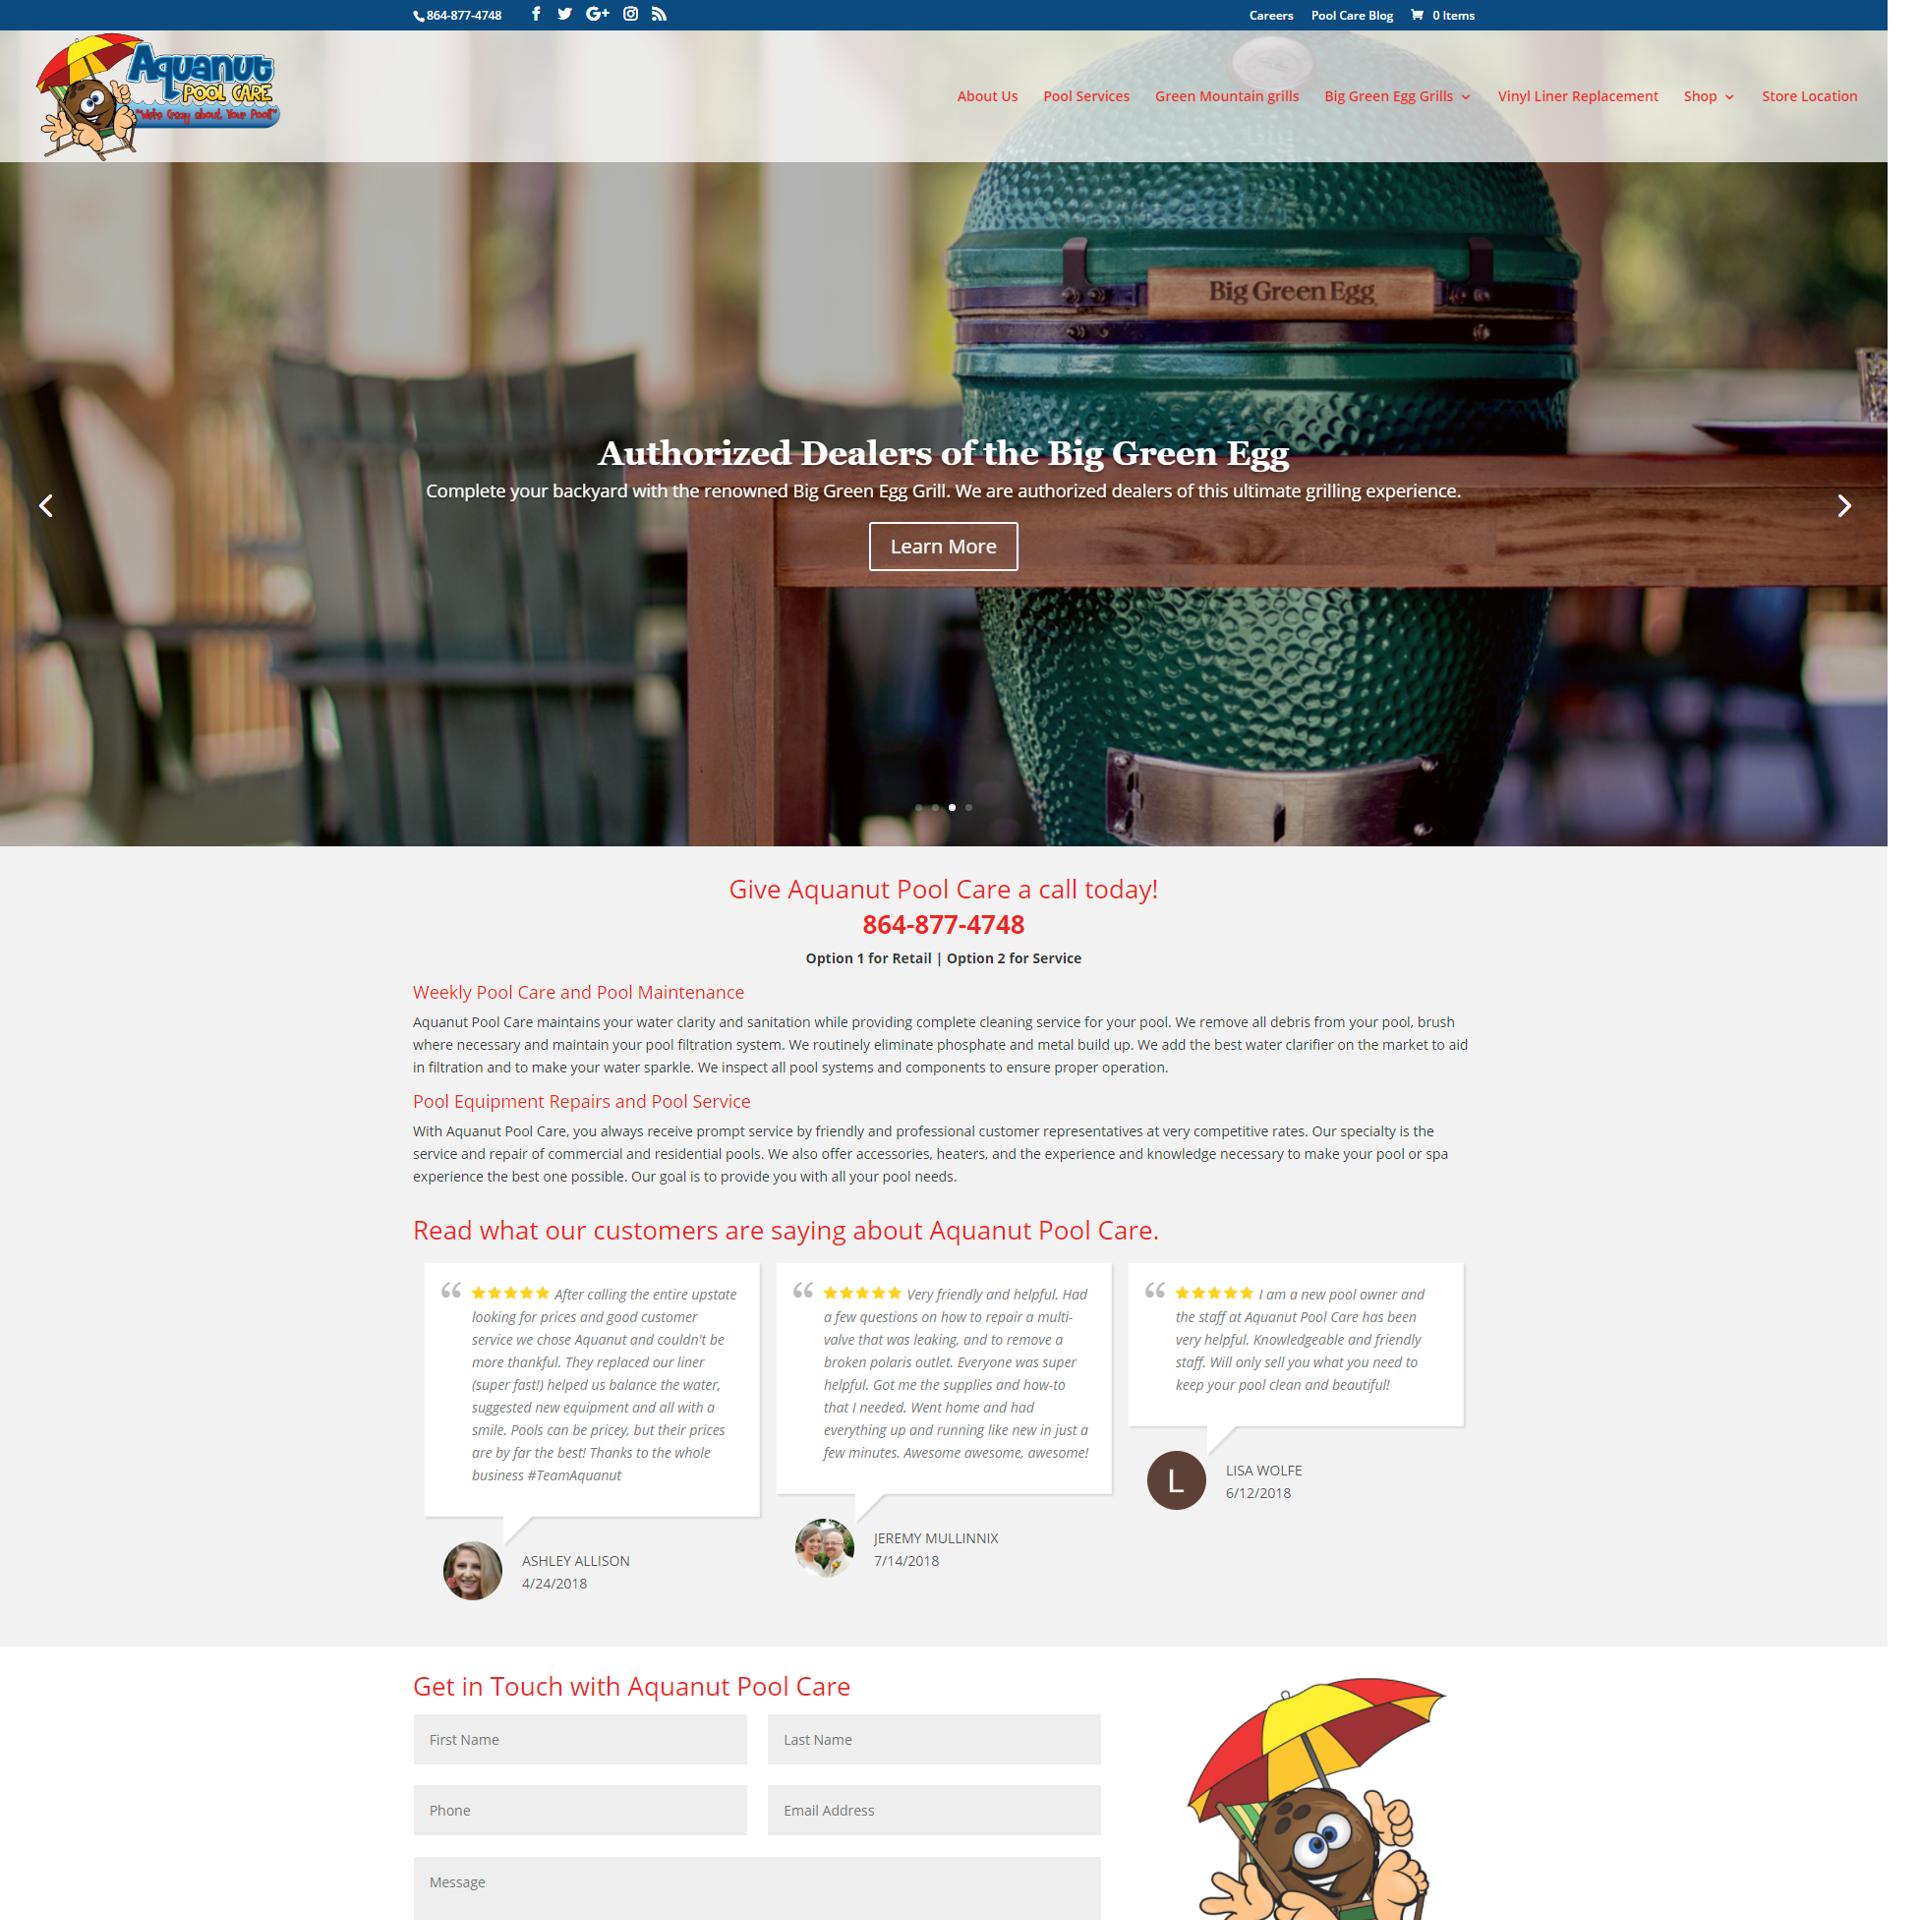 Aquanut Pool Care Website Design and Development